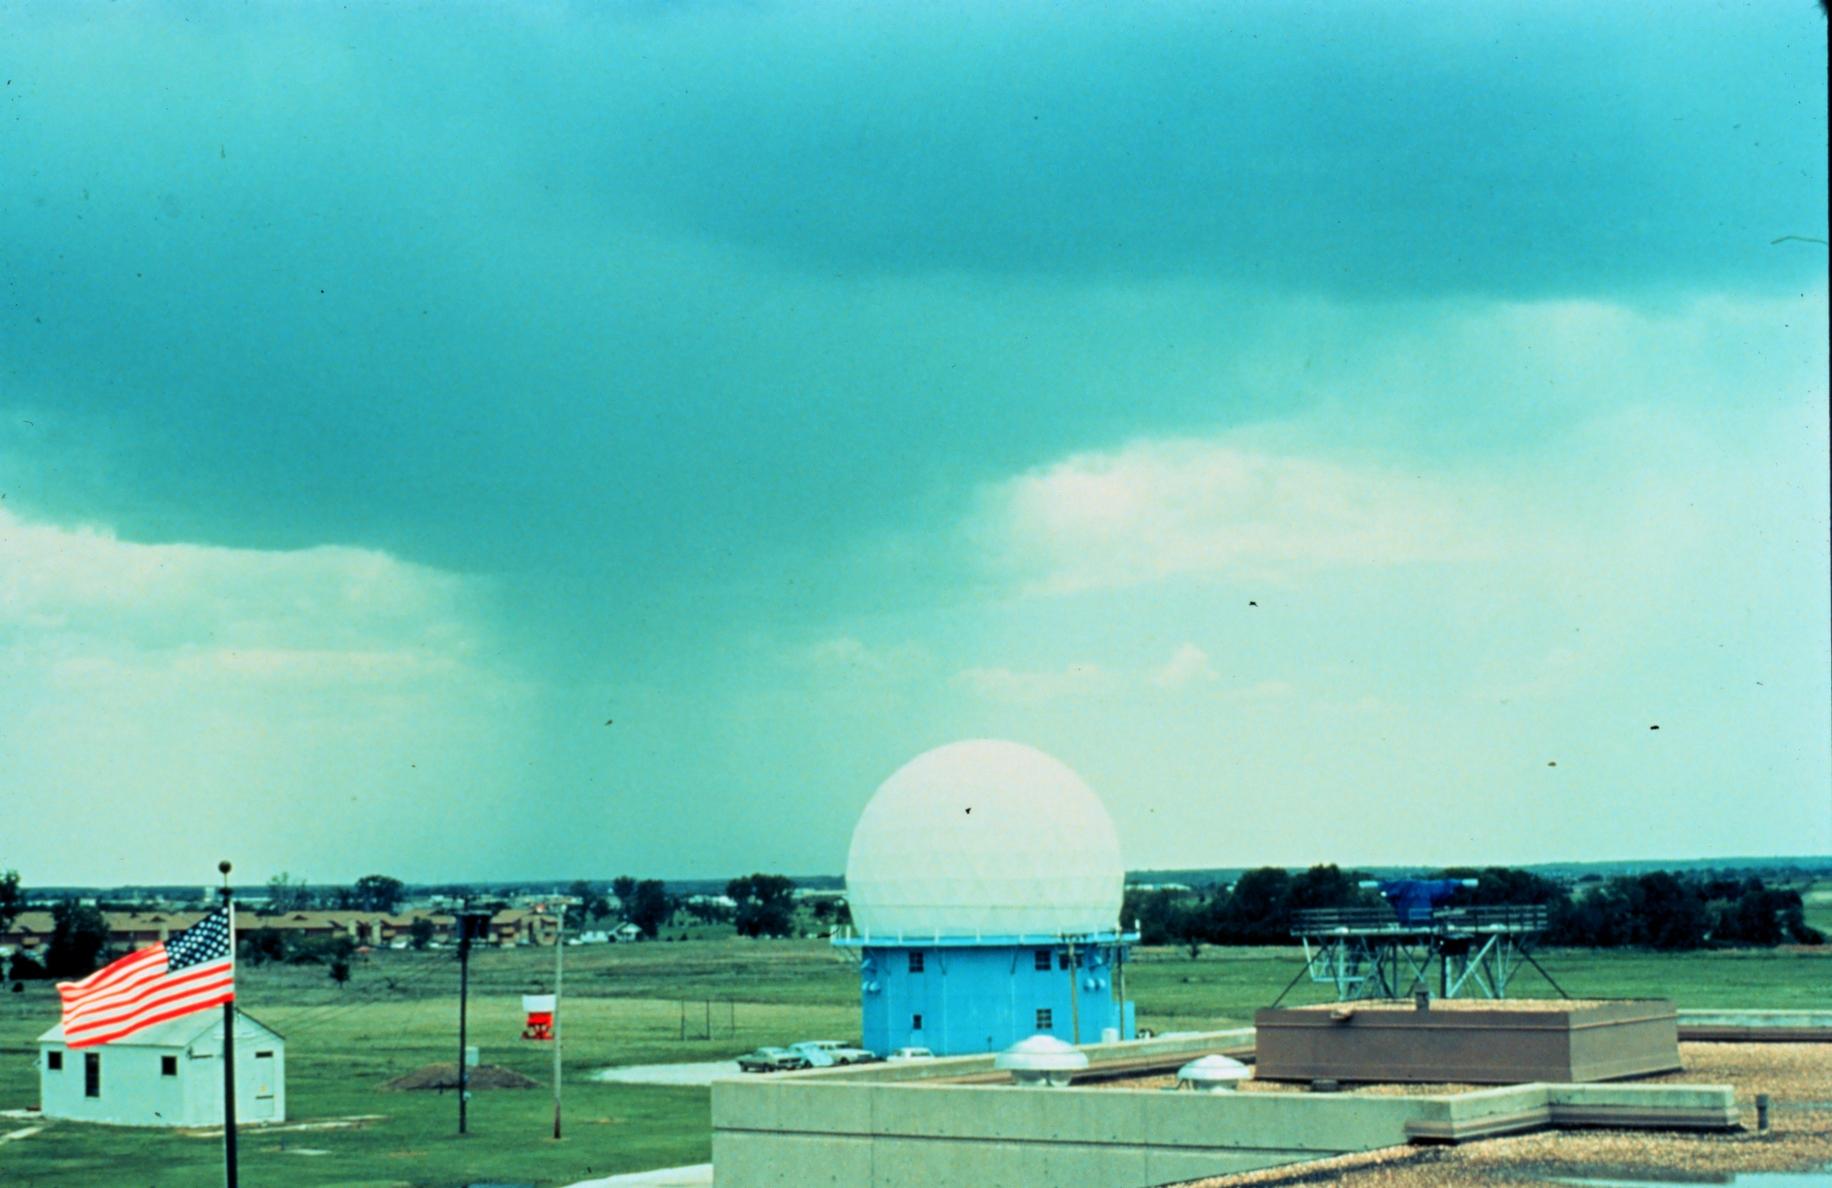 Weather Radar: Weather Radar